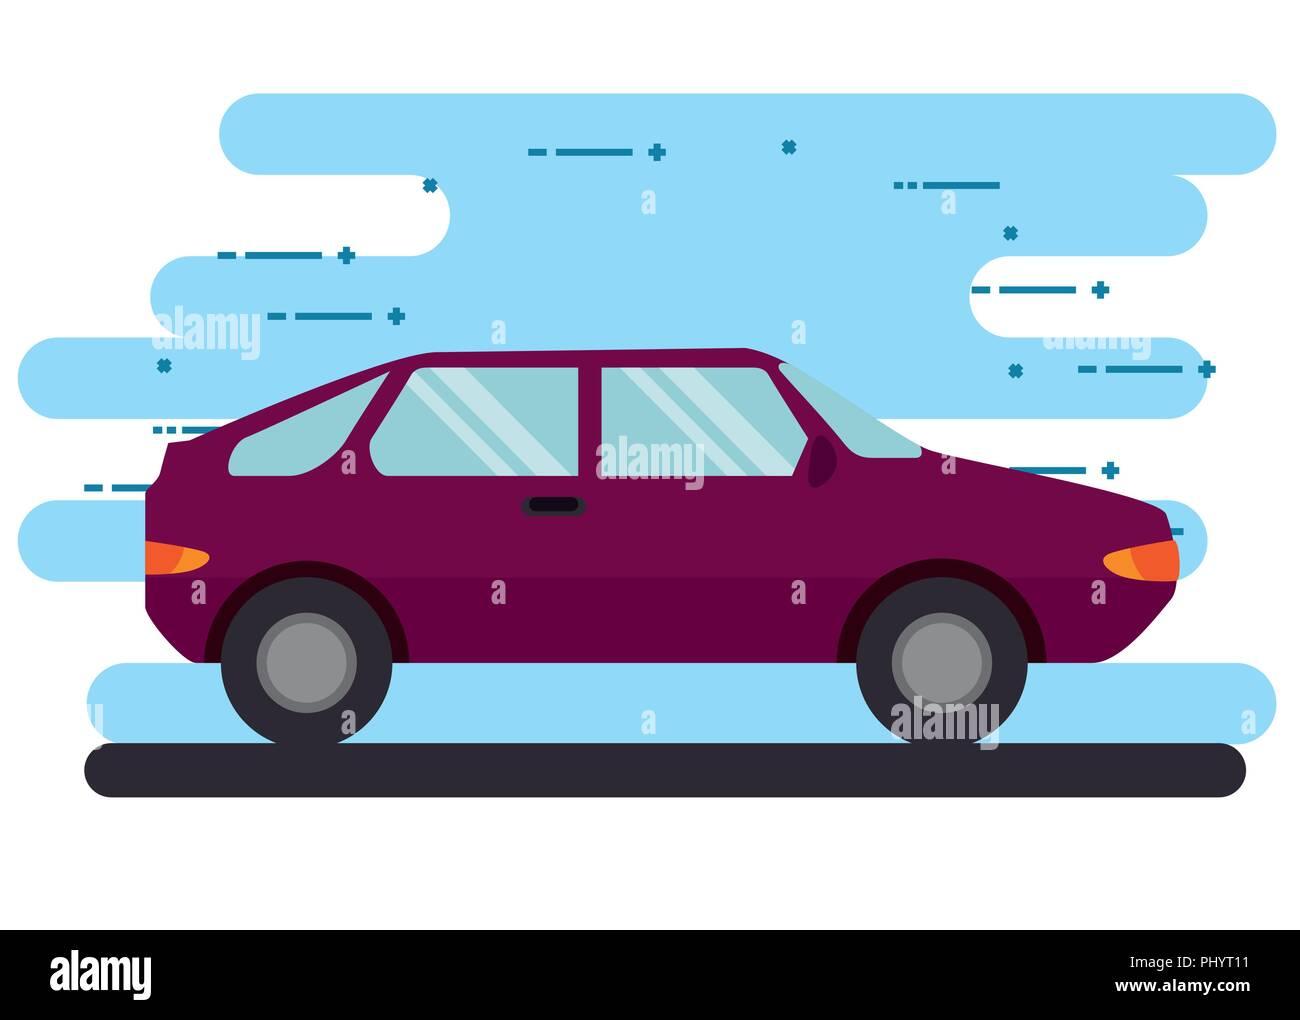 car vehicle transport icon vector illustration design - Stock Image